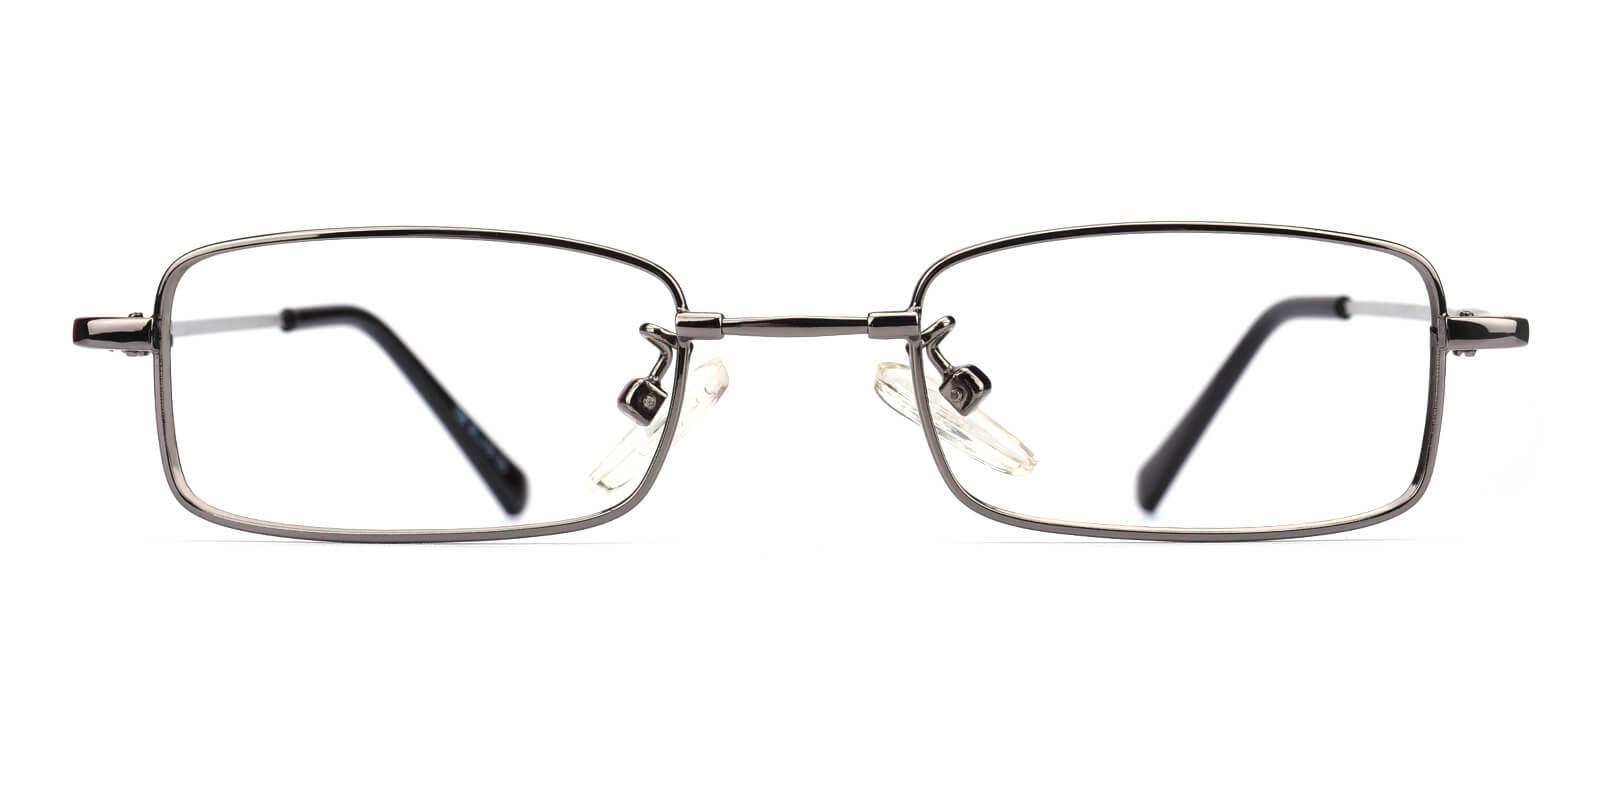 Lanscripe-Gun-Rectangle-Titanium-Eyeglasses-additional2